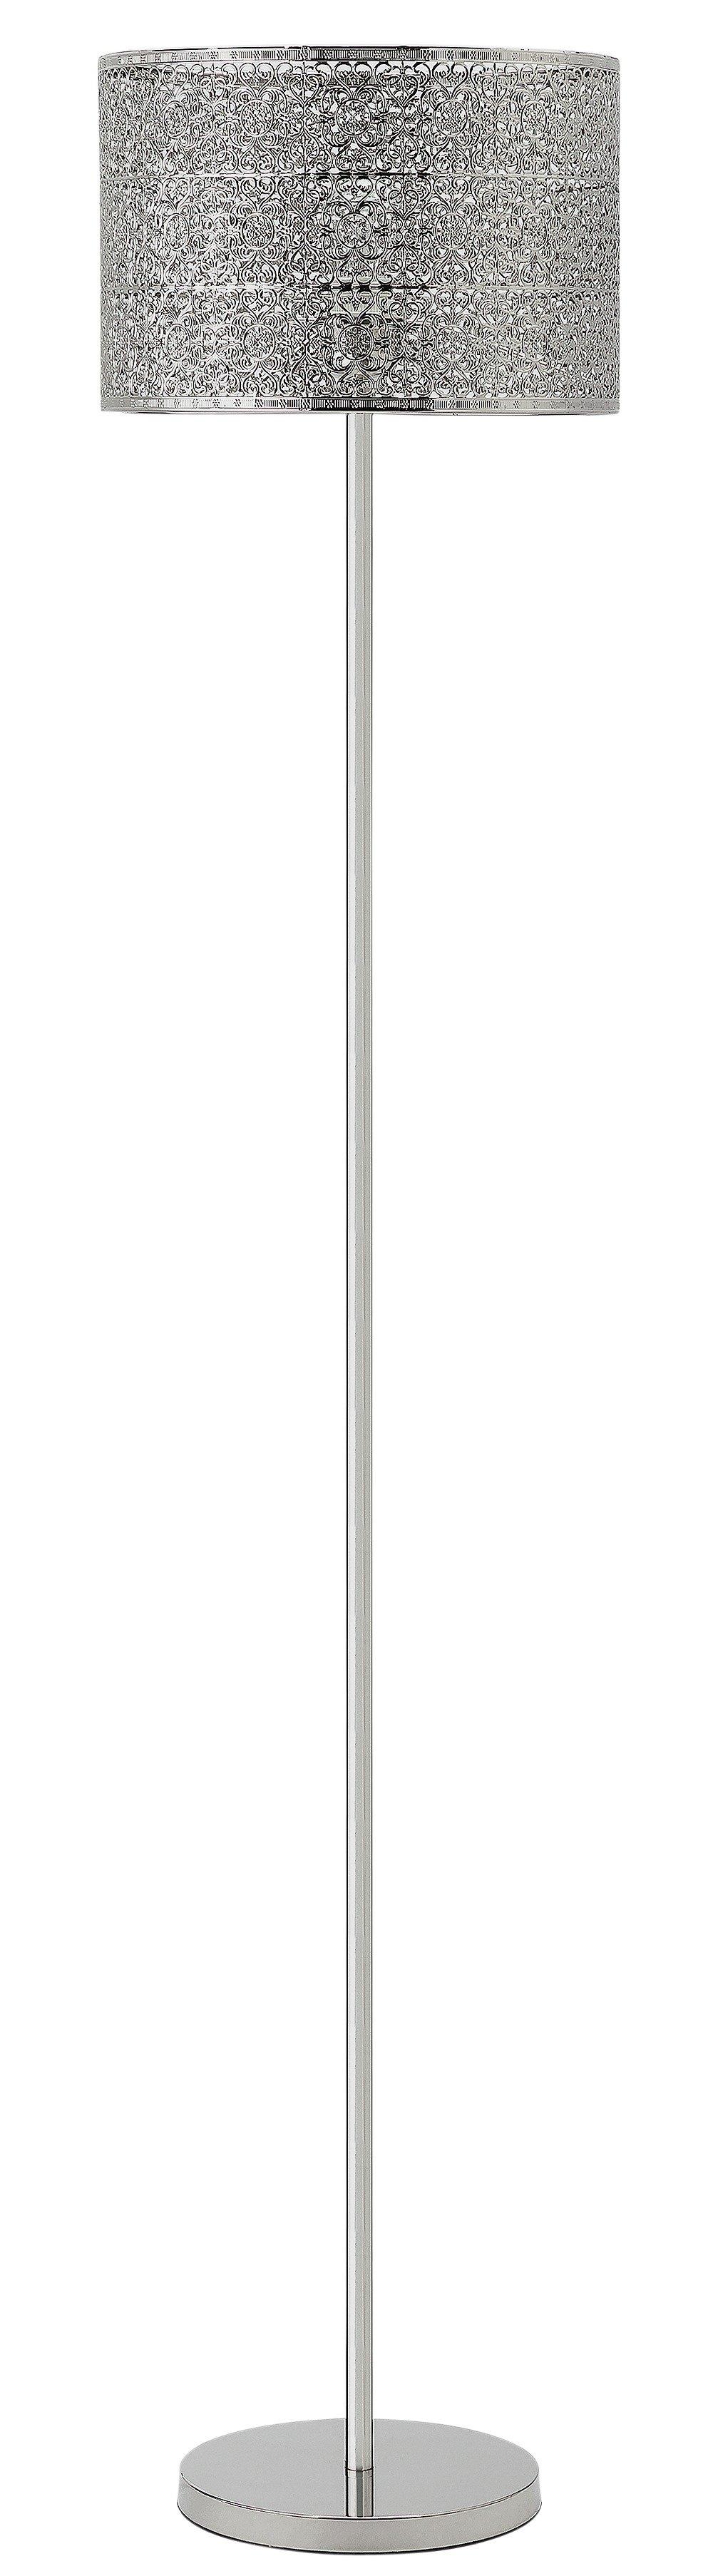 Floor Lamps Page 3 Argos Price Tracker Pricehistory